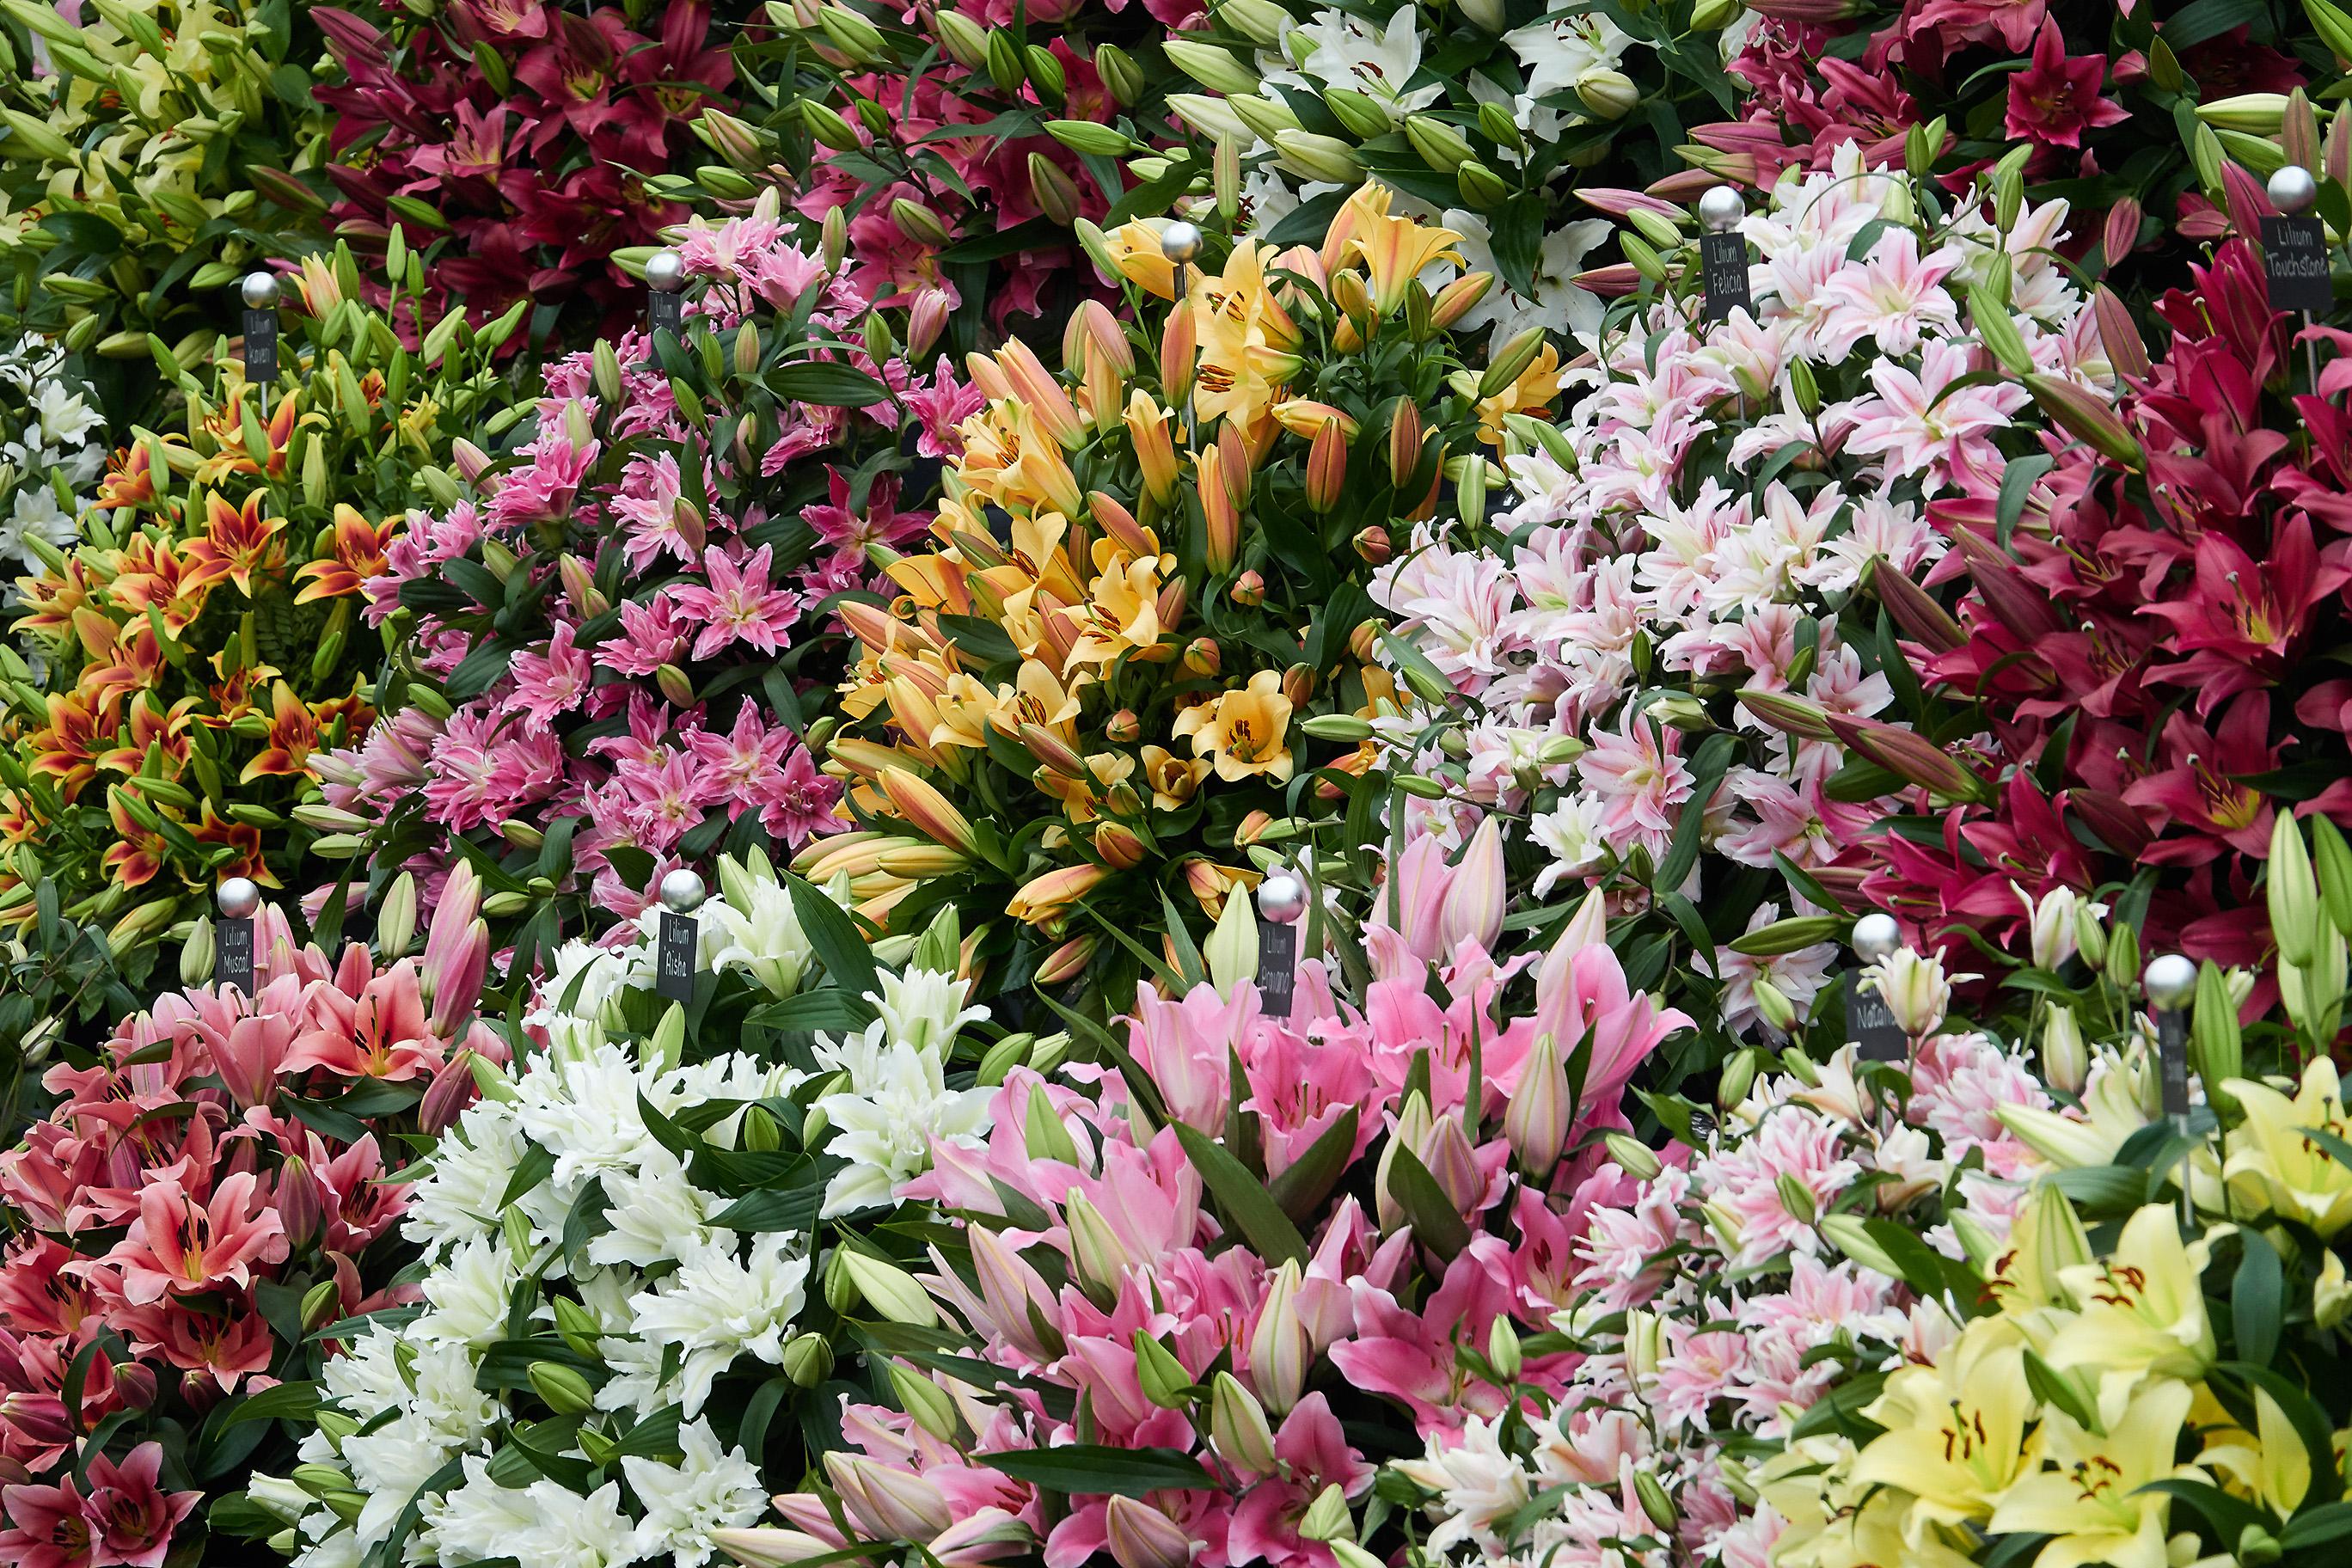 bright-flowers-chelsea-flower-show-2018